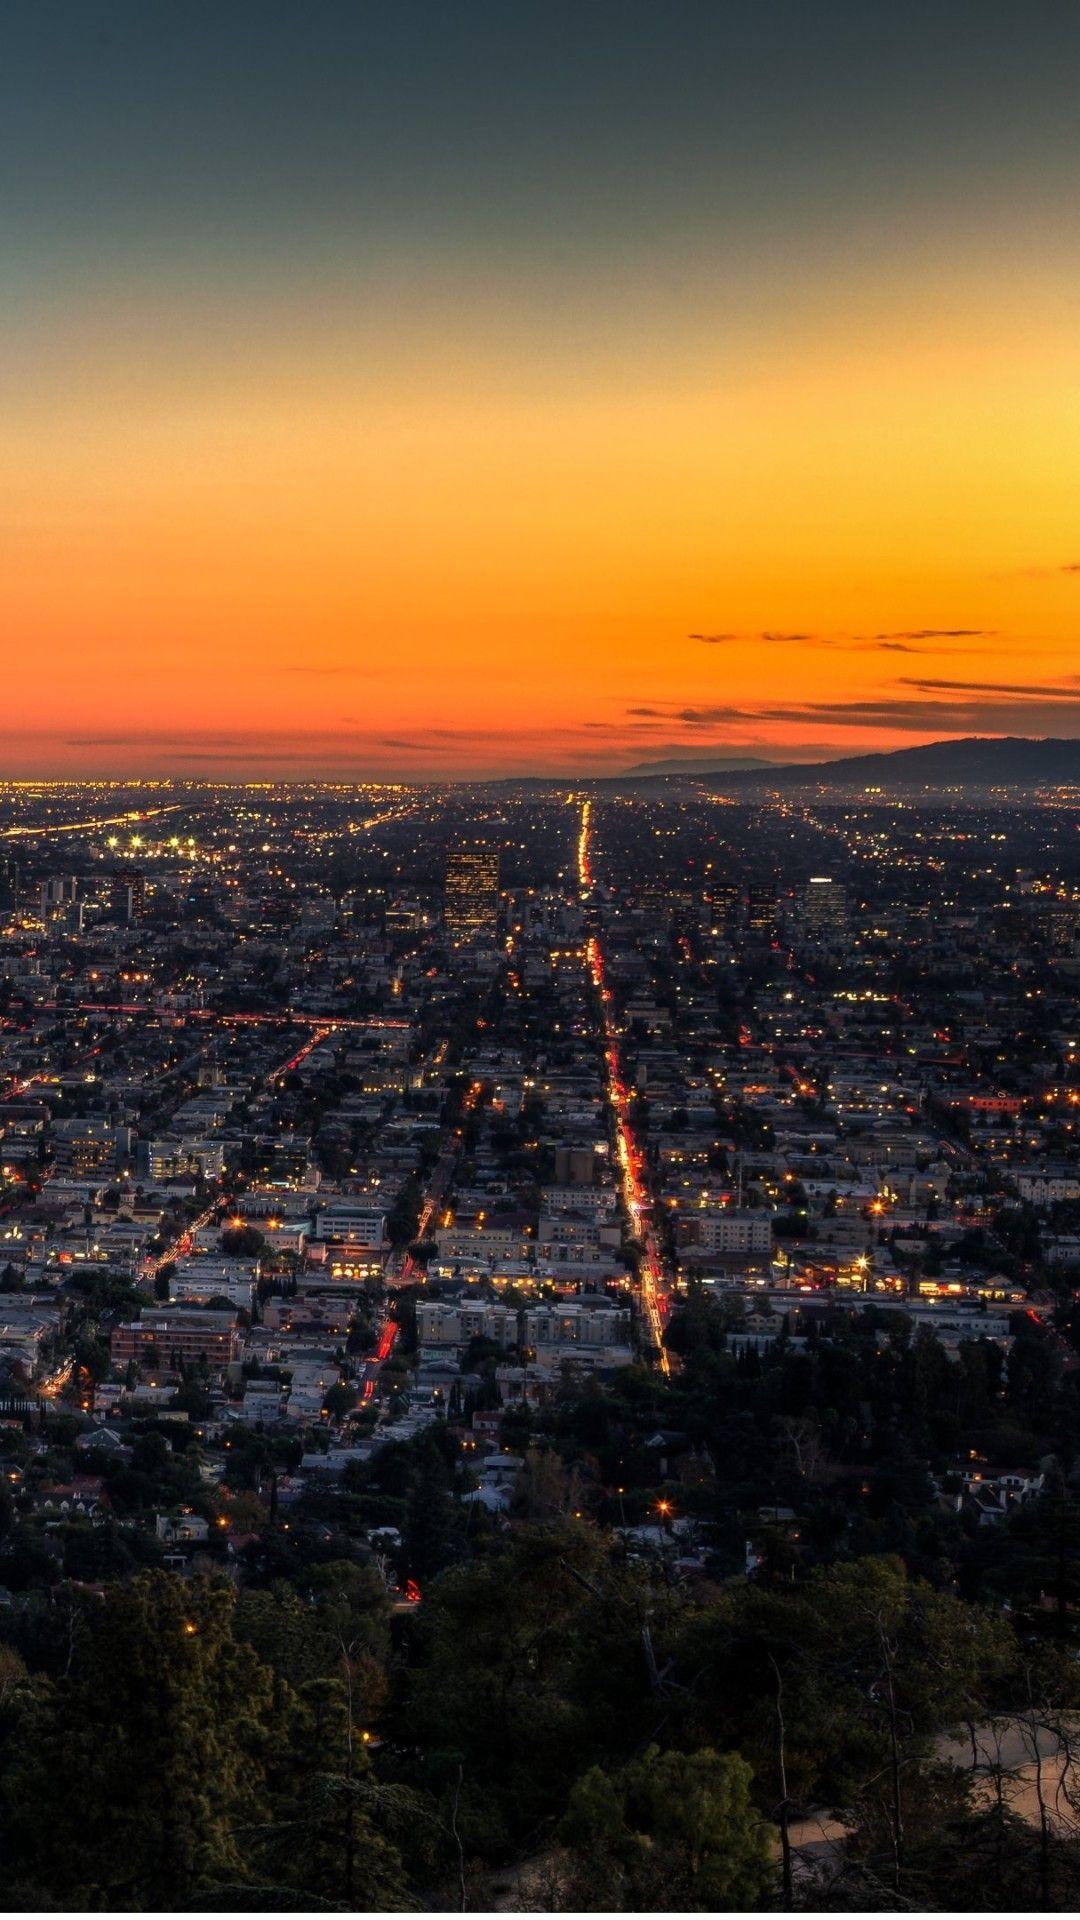 Los Angeles Iphone Wallpapers Top Free Los Angeles Iphone